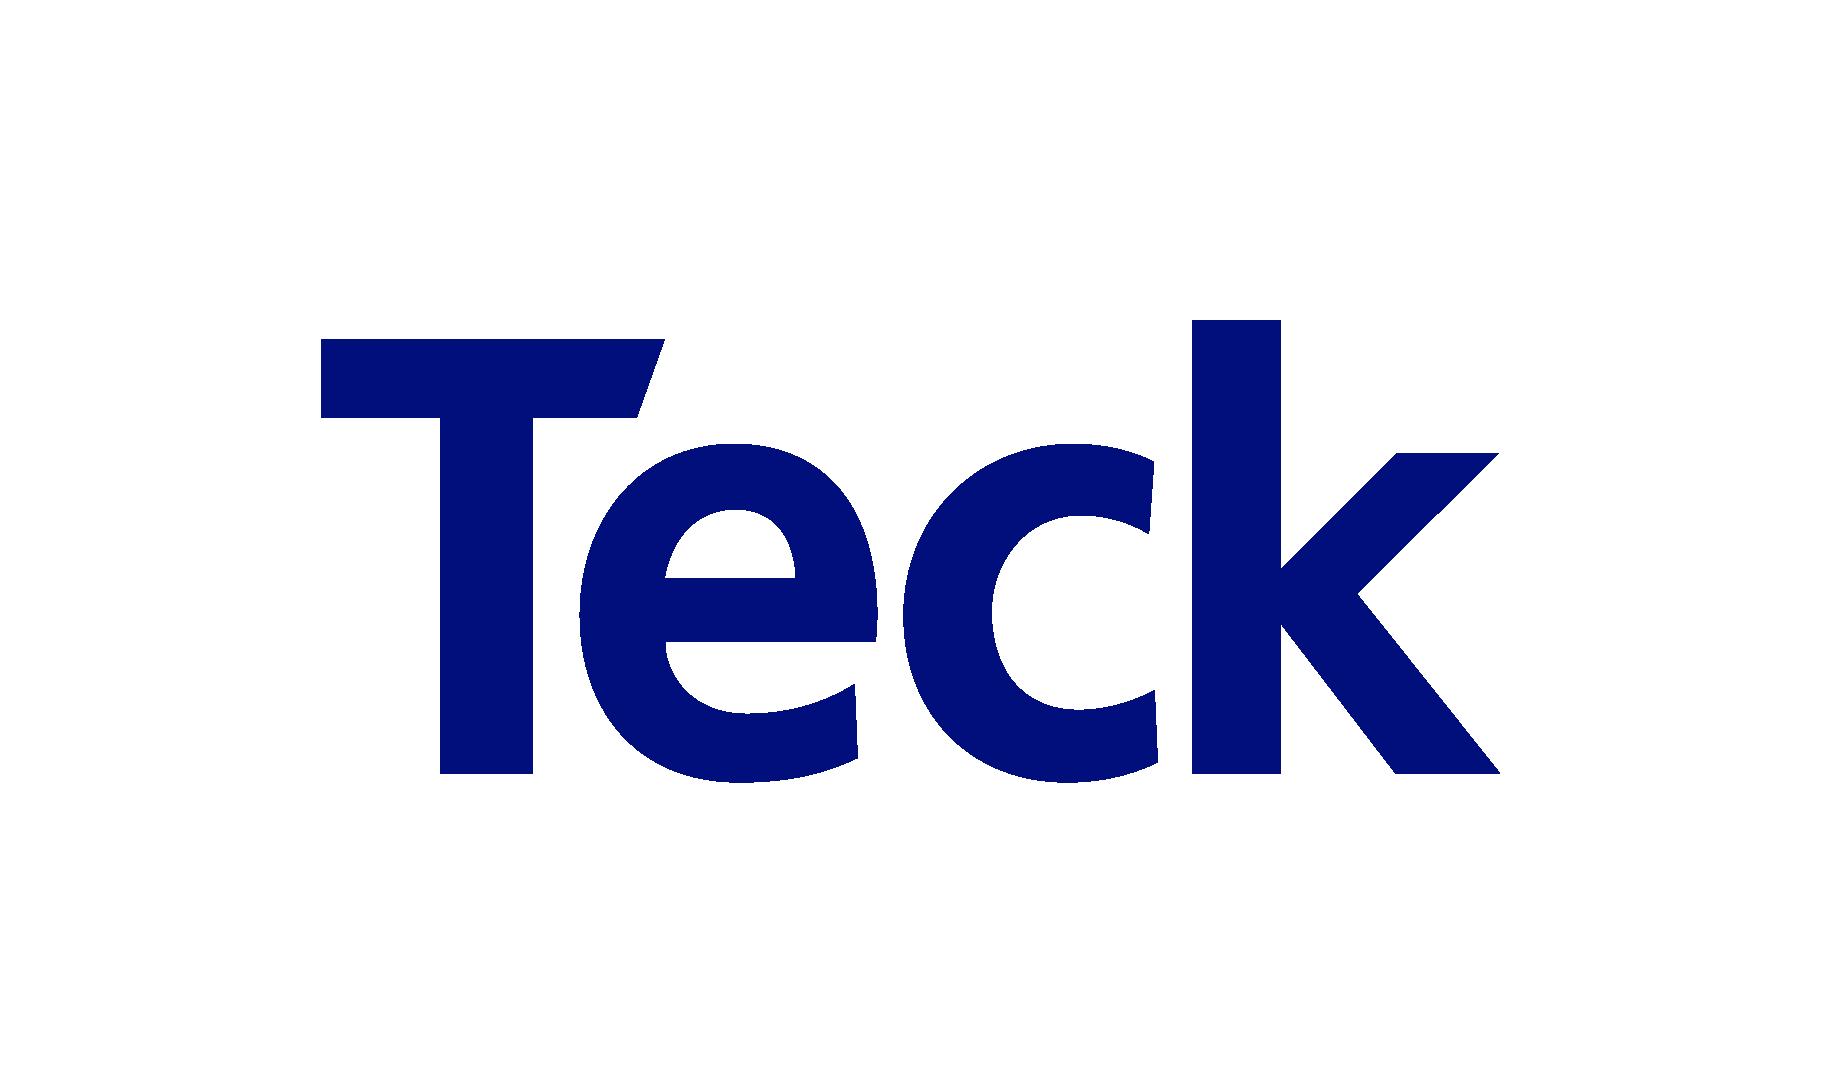 Teck Provides Steelmaking Coal Market Update